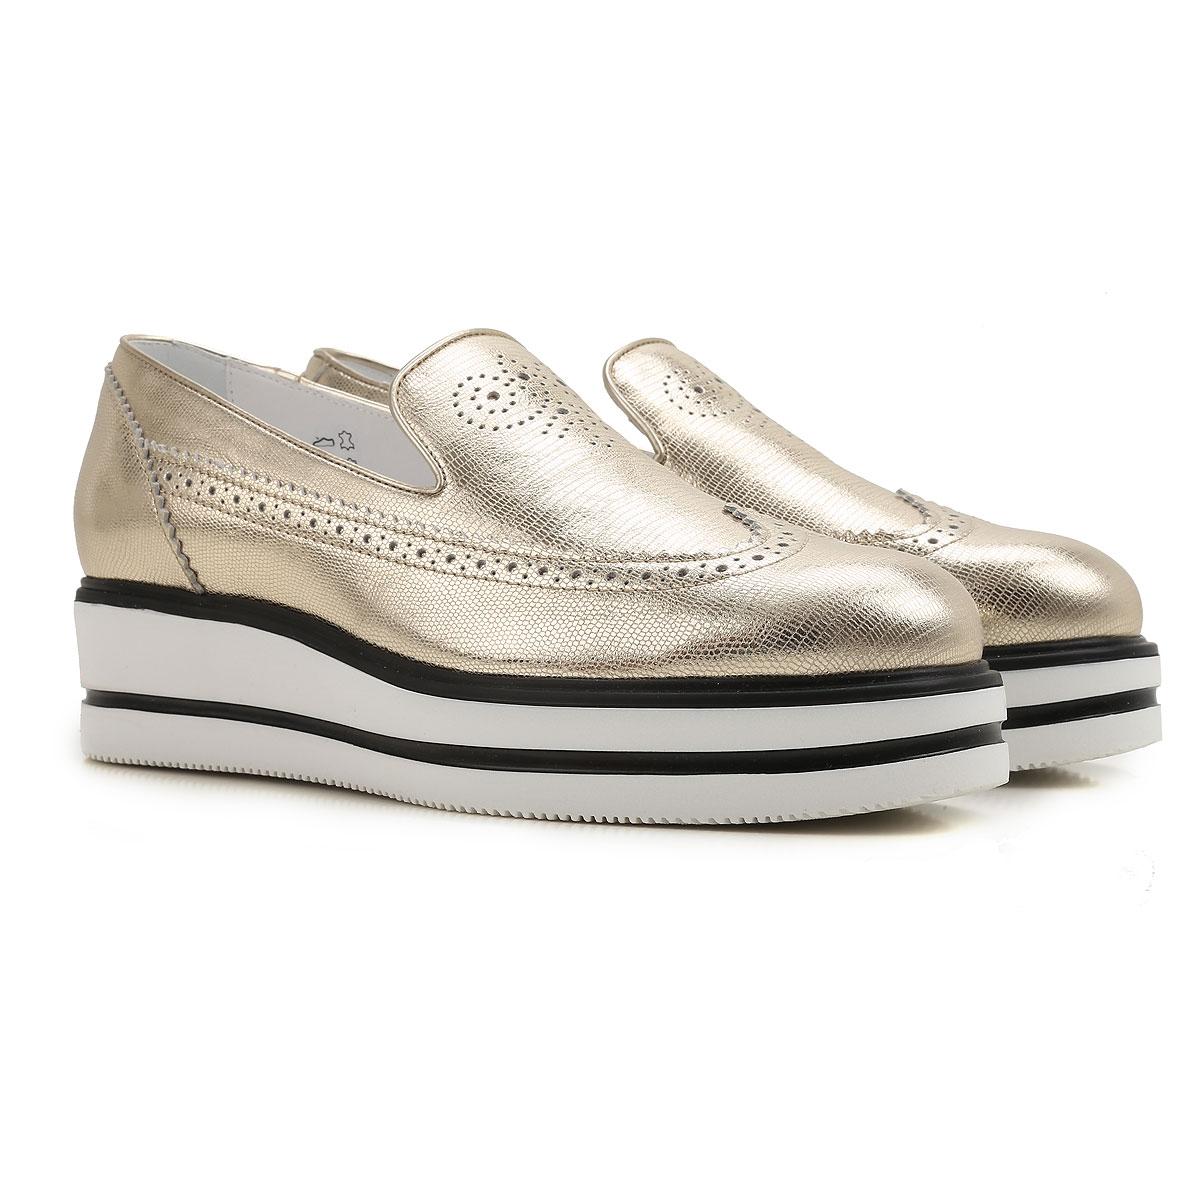 Womens Shoes Hogan Style code hxw3230x780fewb202 402791